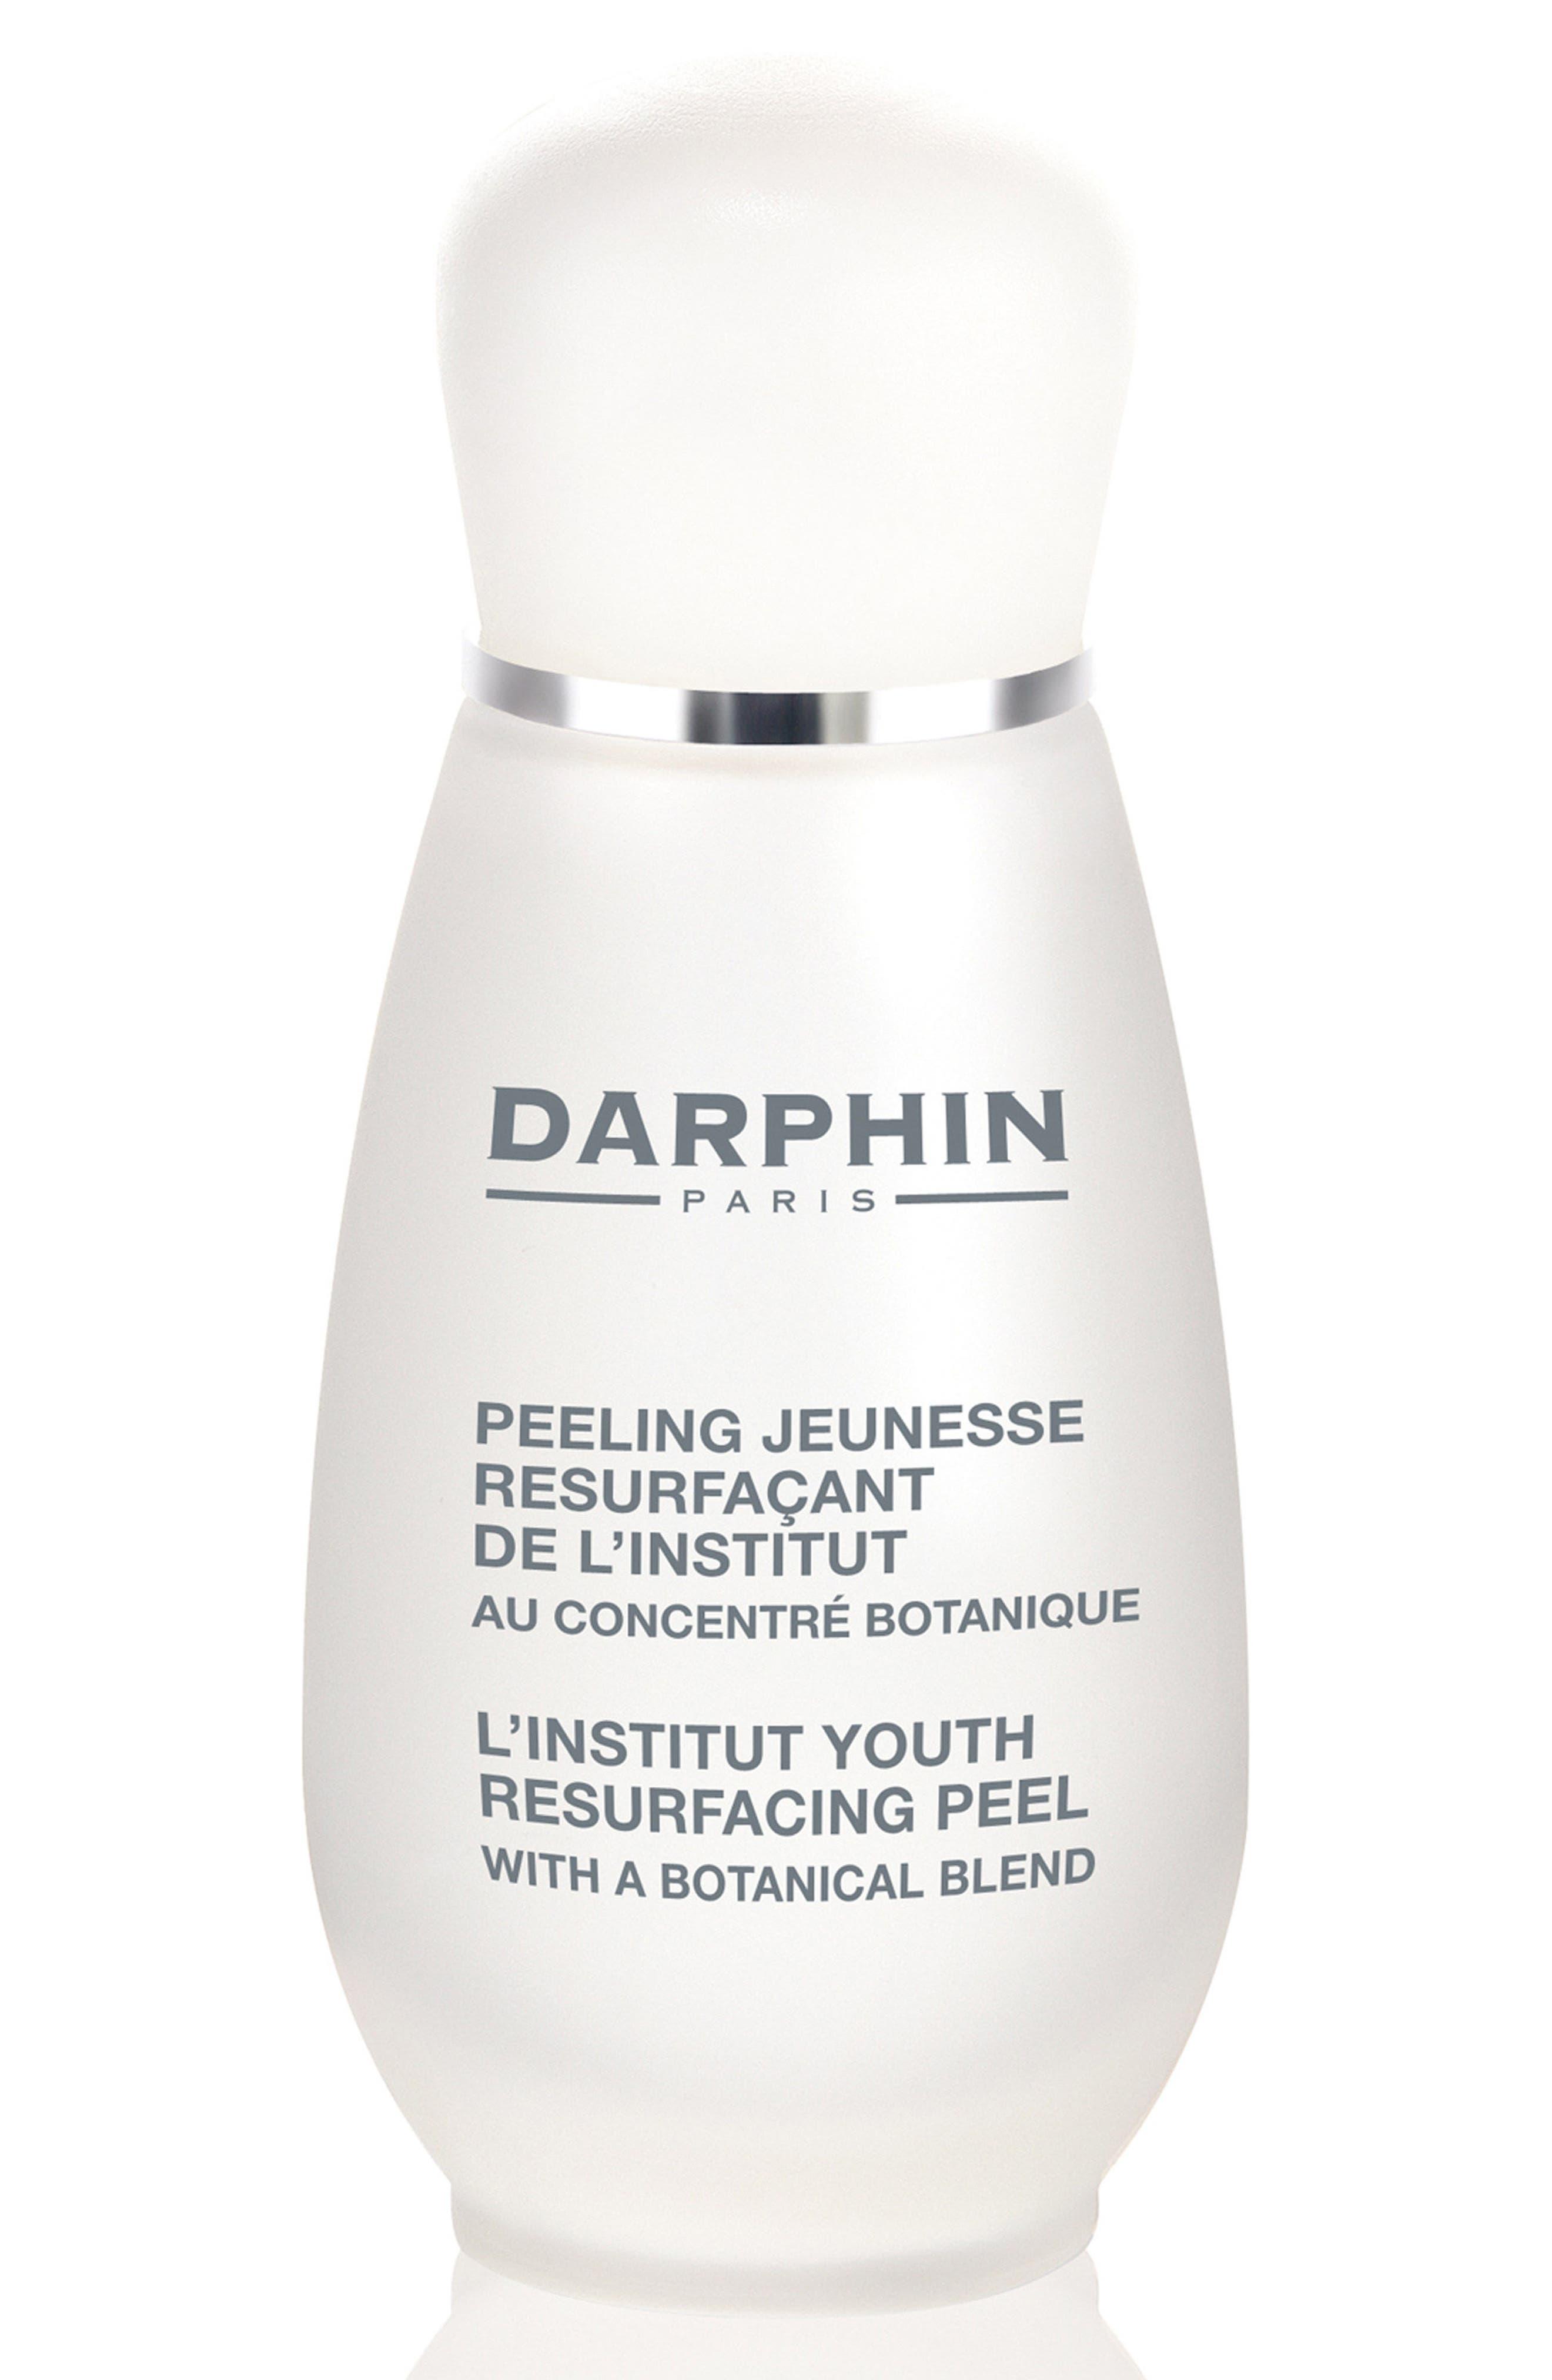 DARPHIN L'INSTITUT YOUTH RESURFACING PEEL